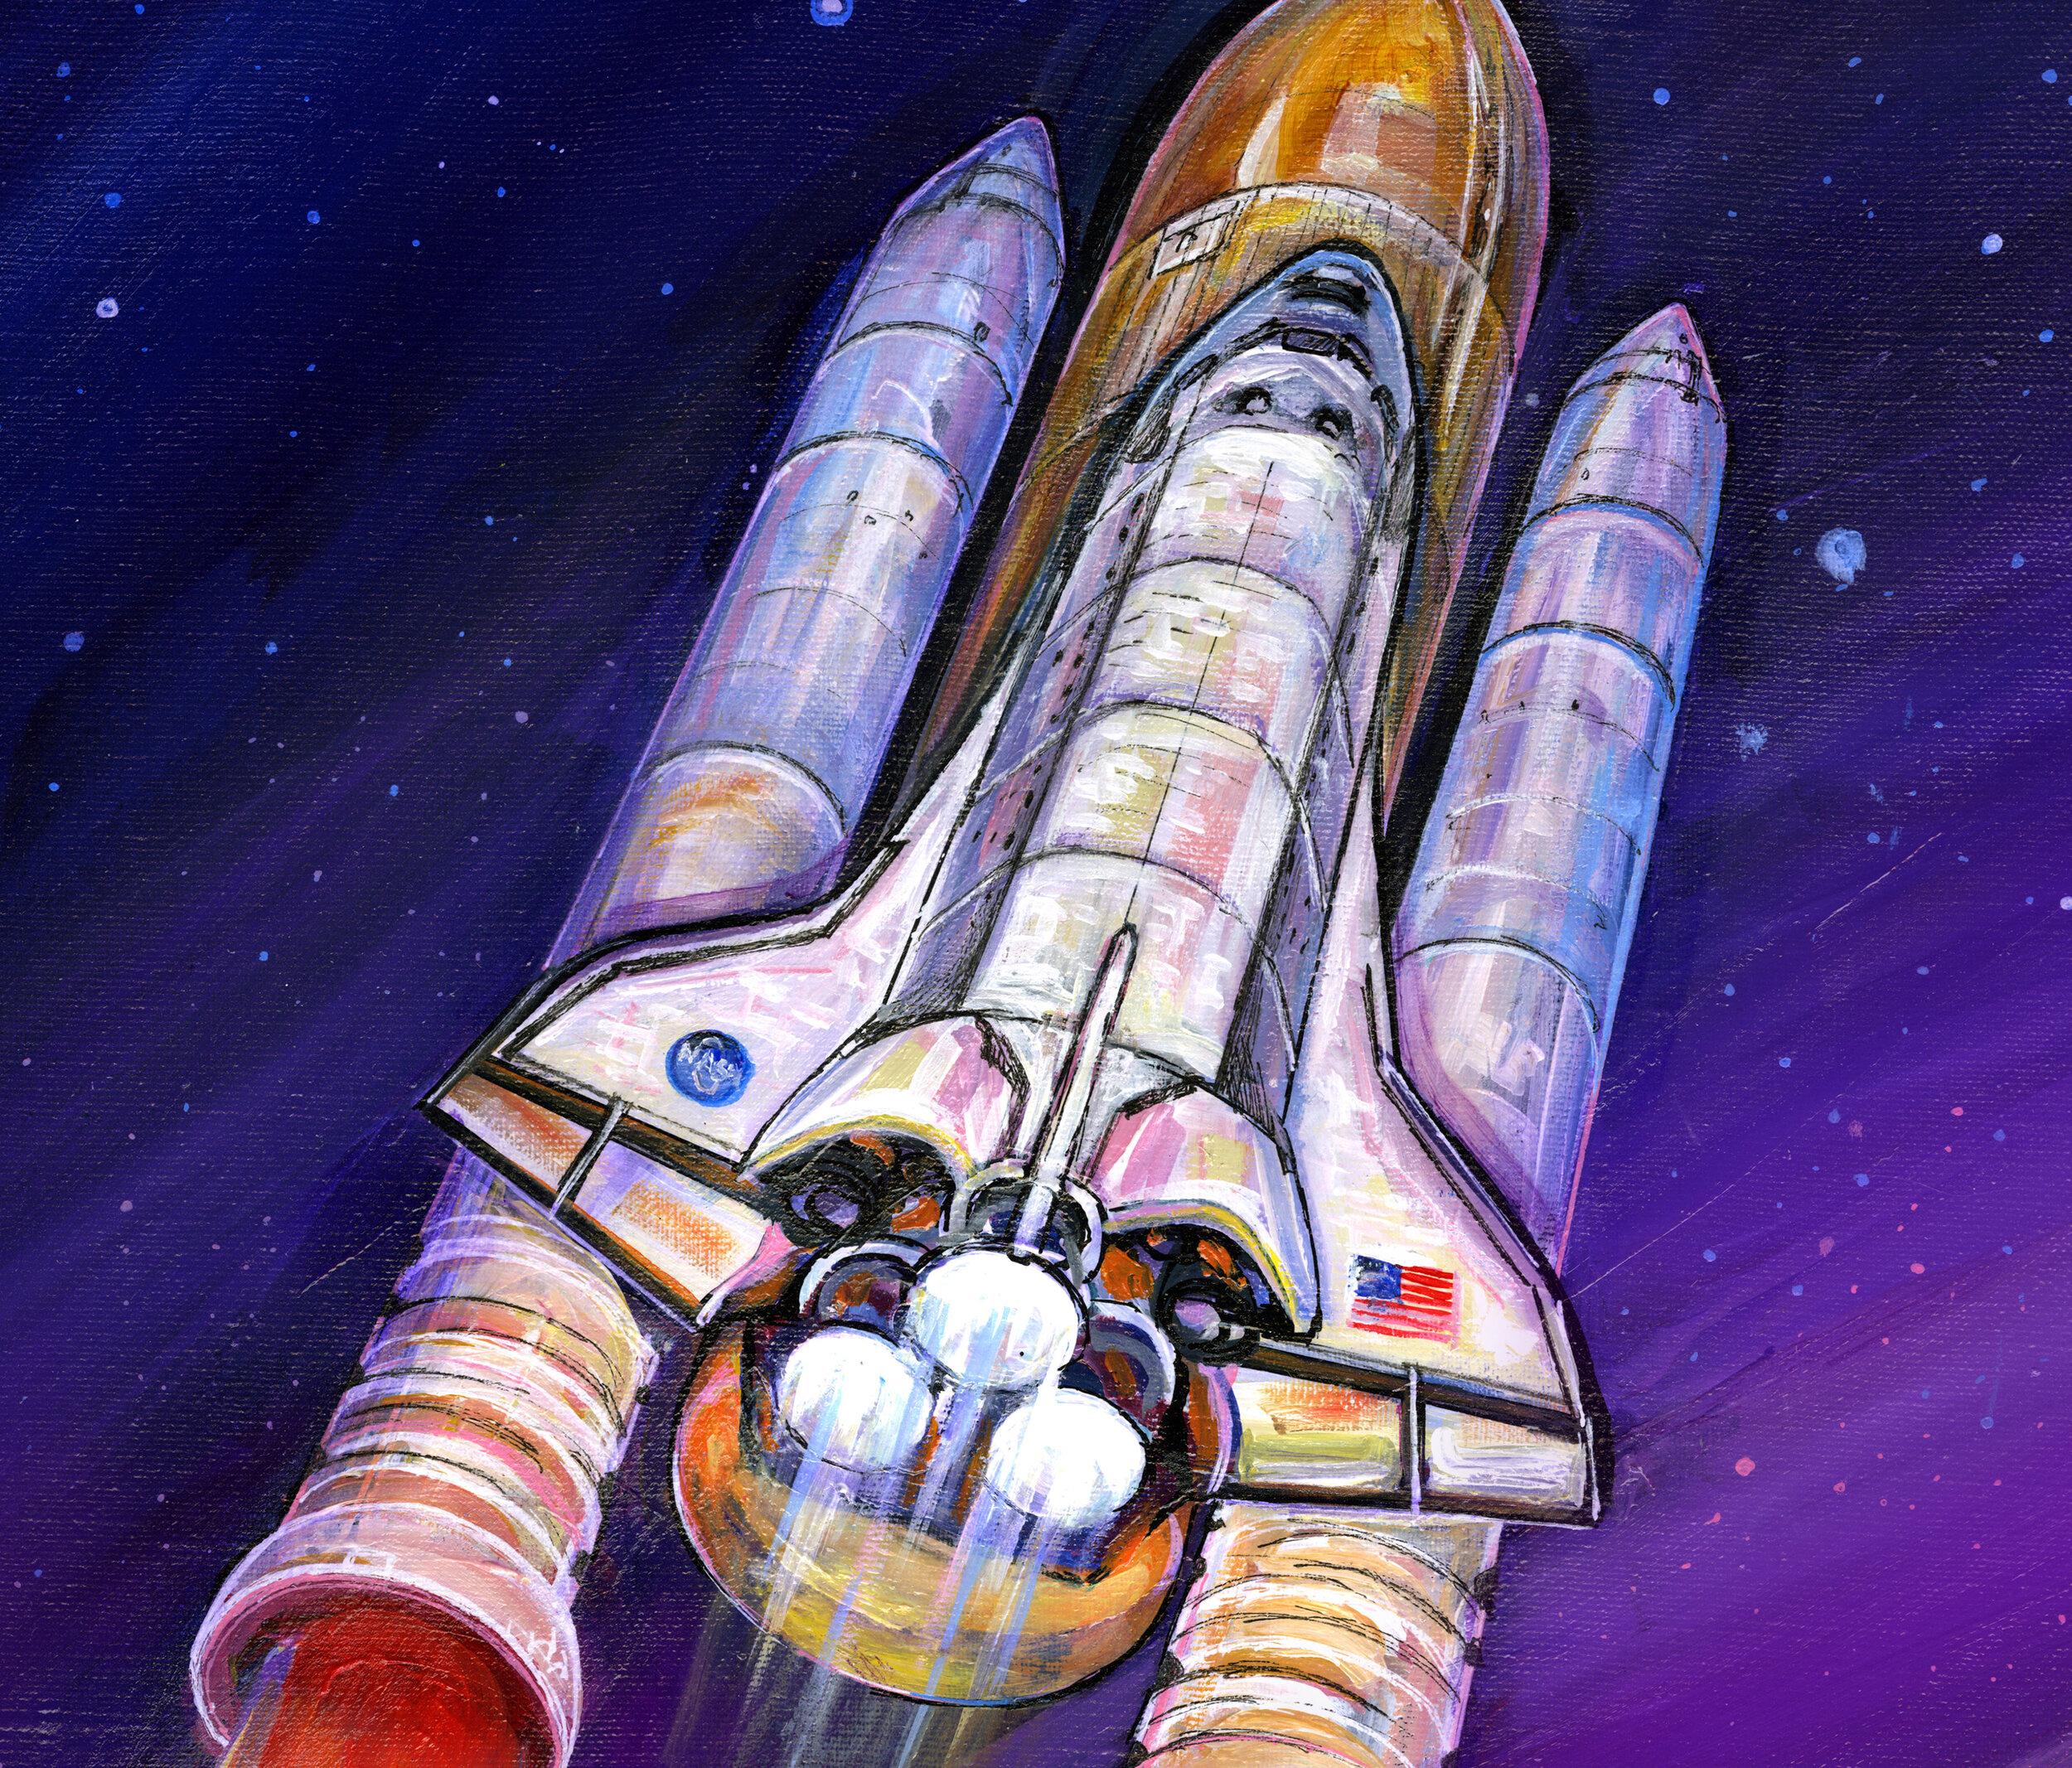 shuttle-big-2.jpg